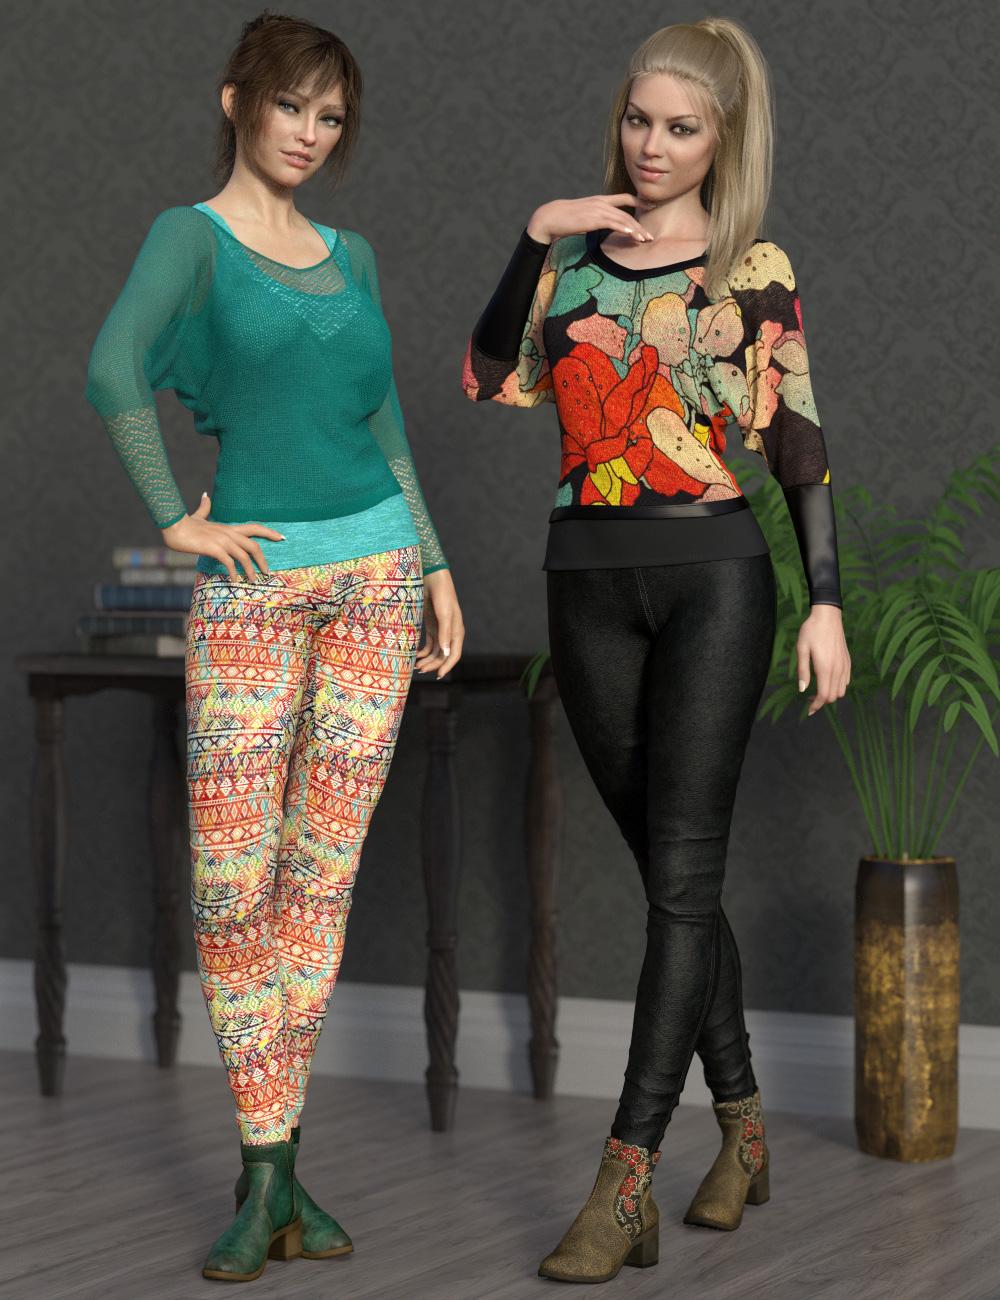 dForce Collection 04 Texture Expansion by: esha, 3D Models by Daz 3D